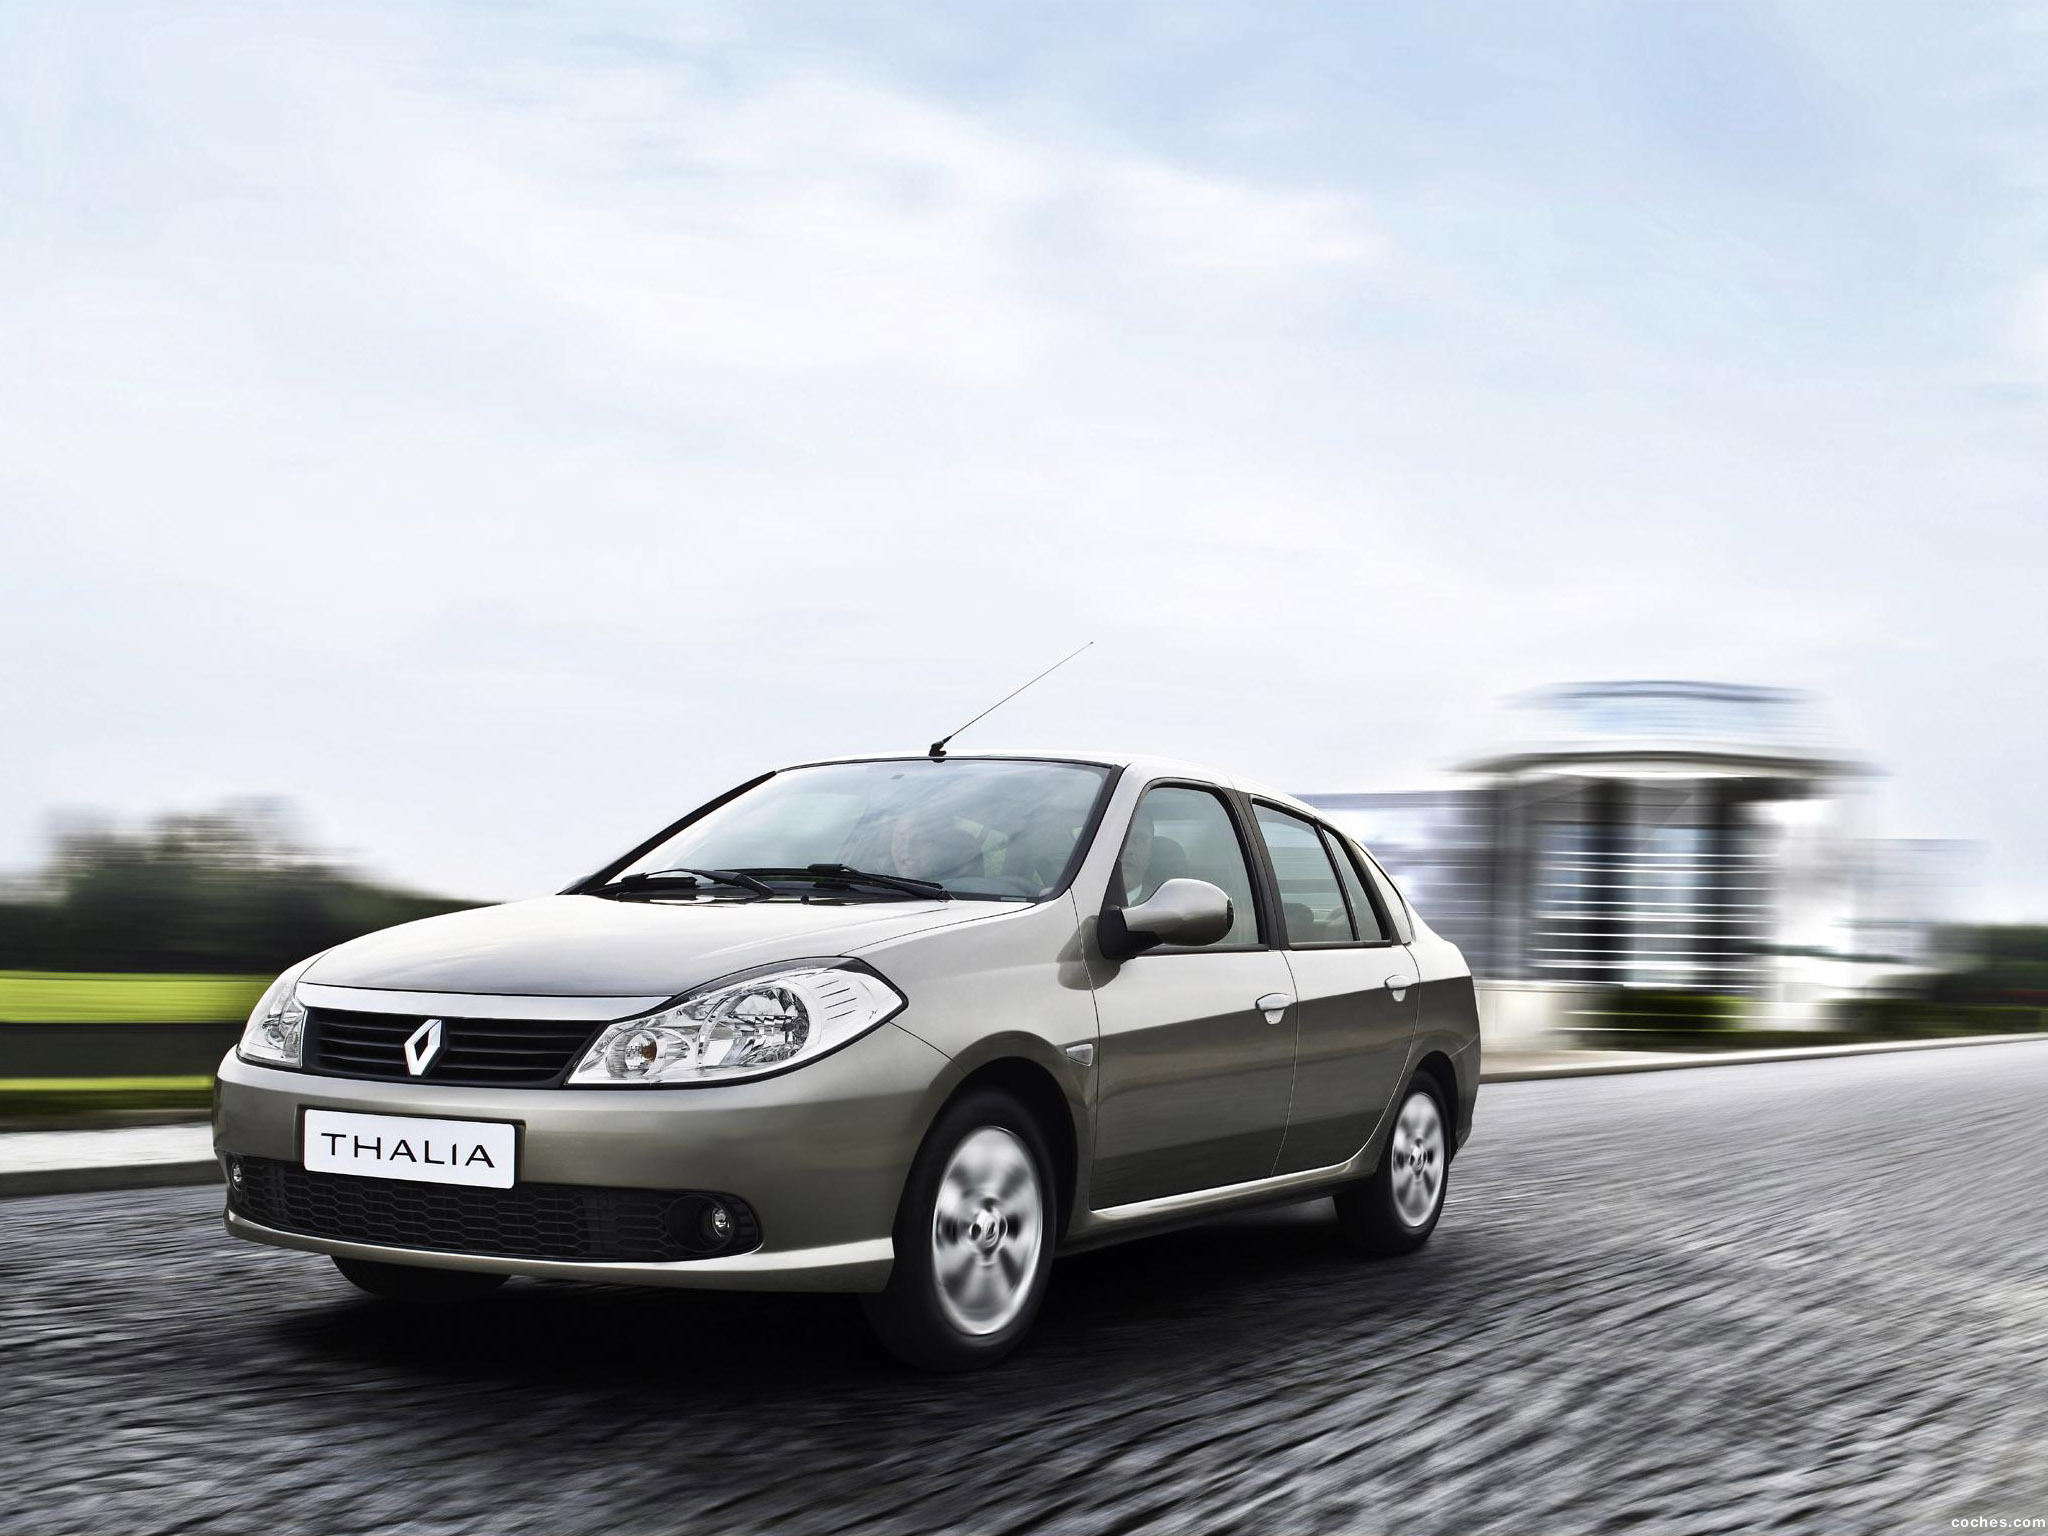 Fotos de Renault Thalia Symbol 2008